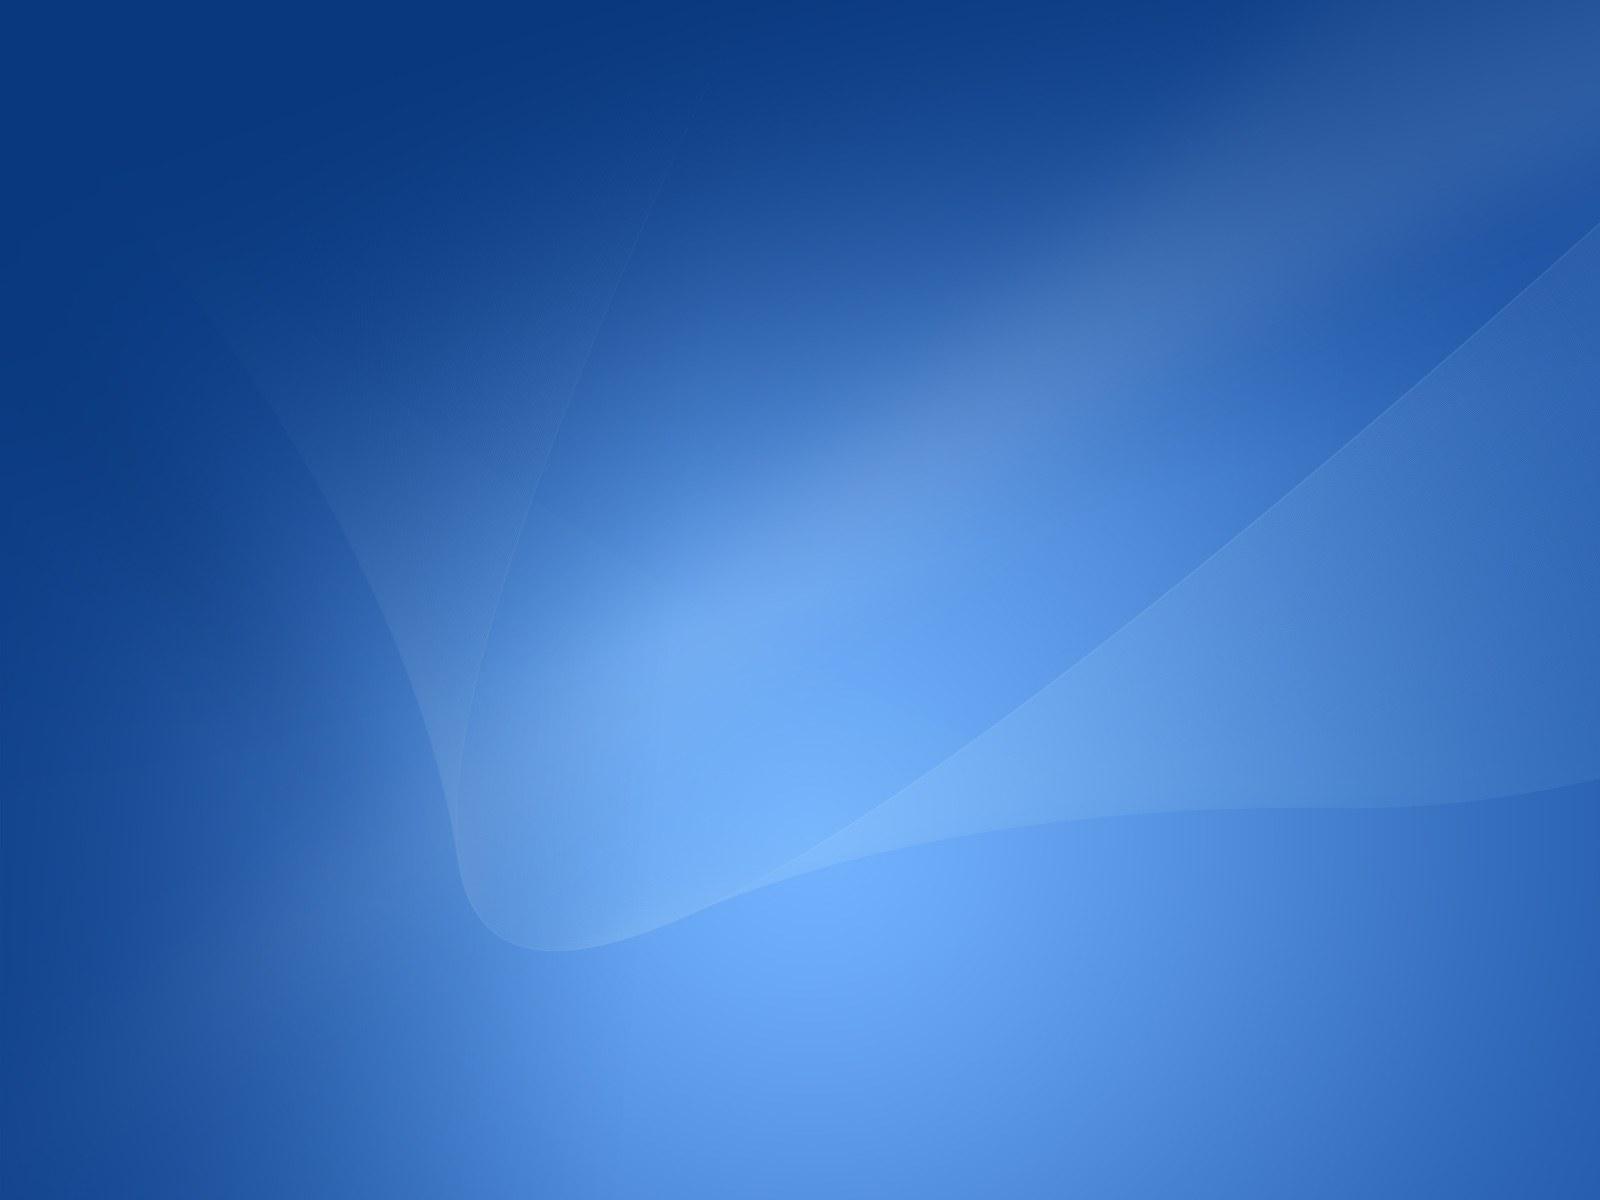 Mac OS X Wallpaper 1600x1200